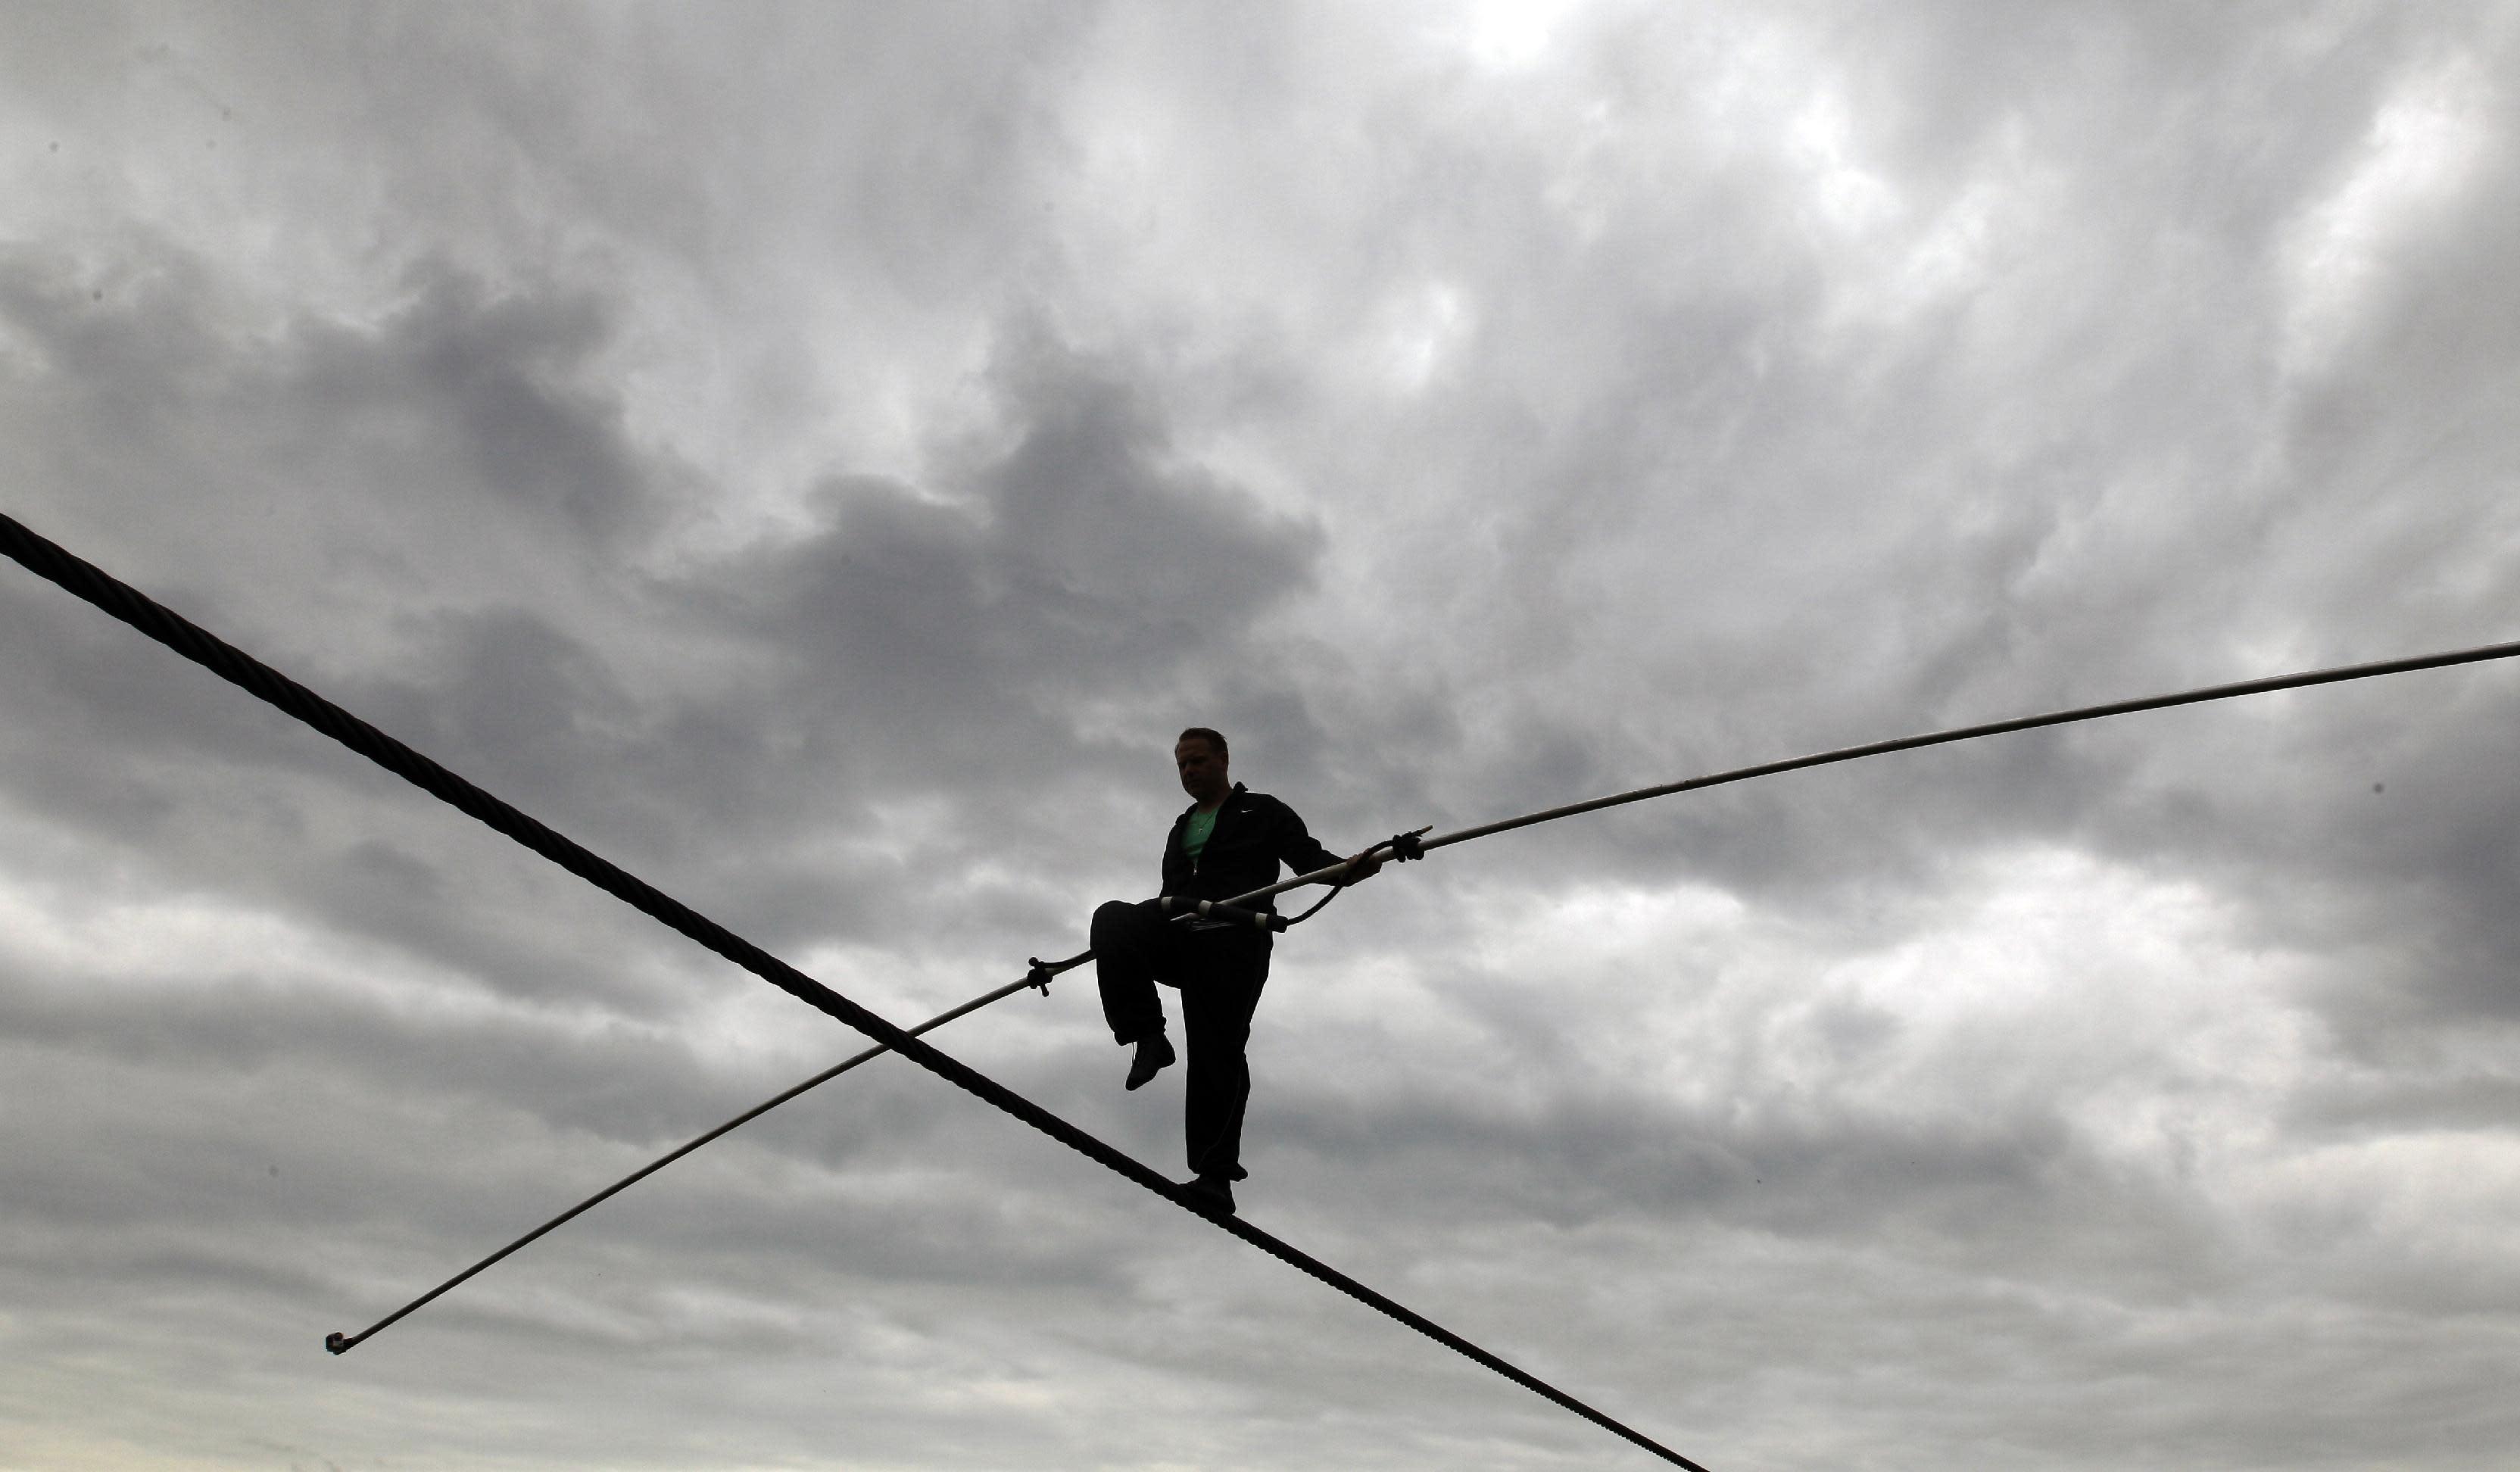 Wallenda to be tethered to Niagara Falls tightrope